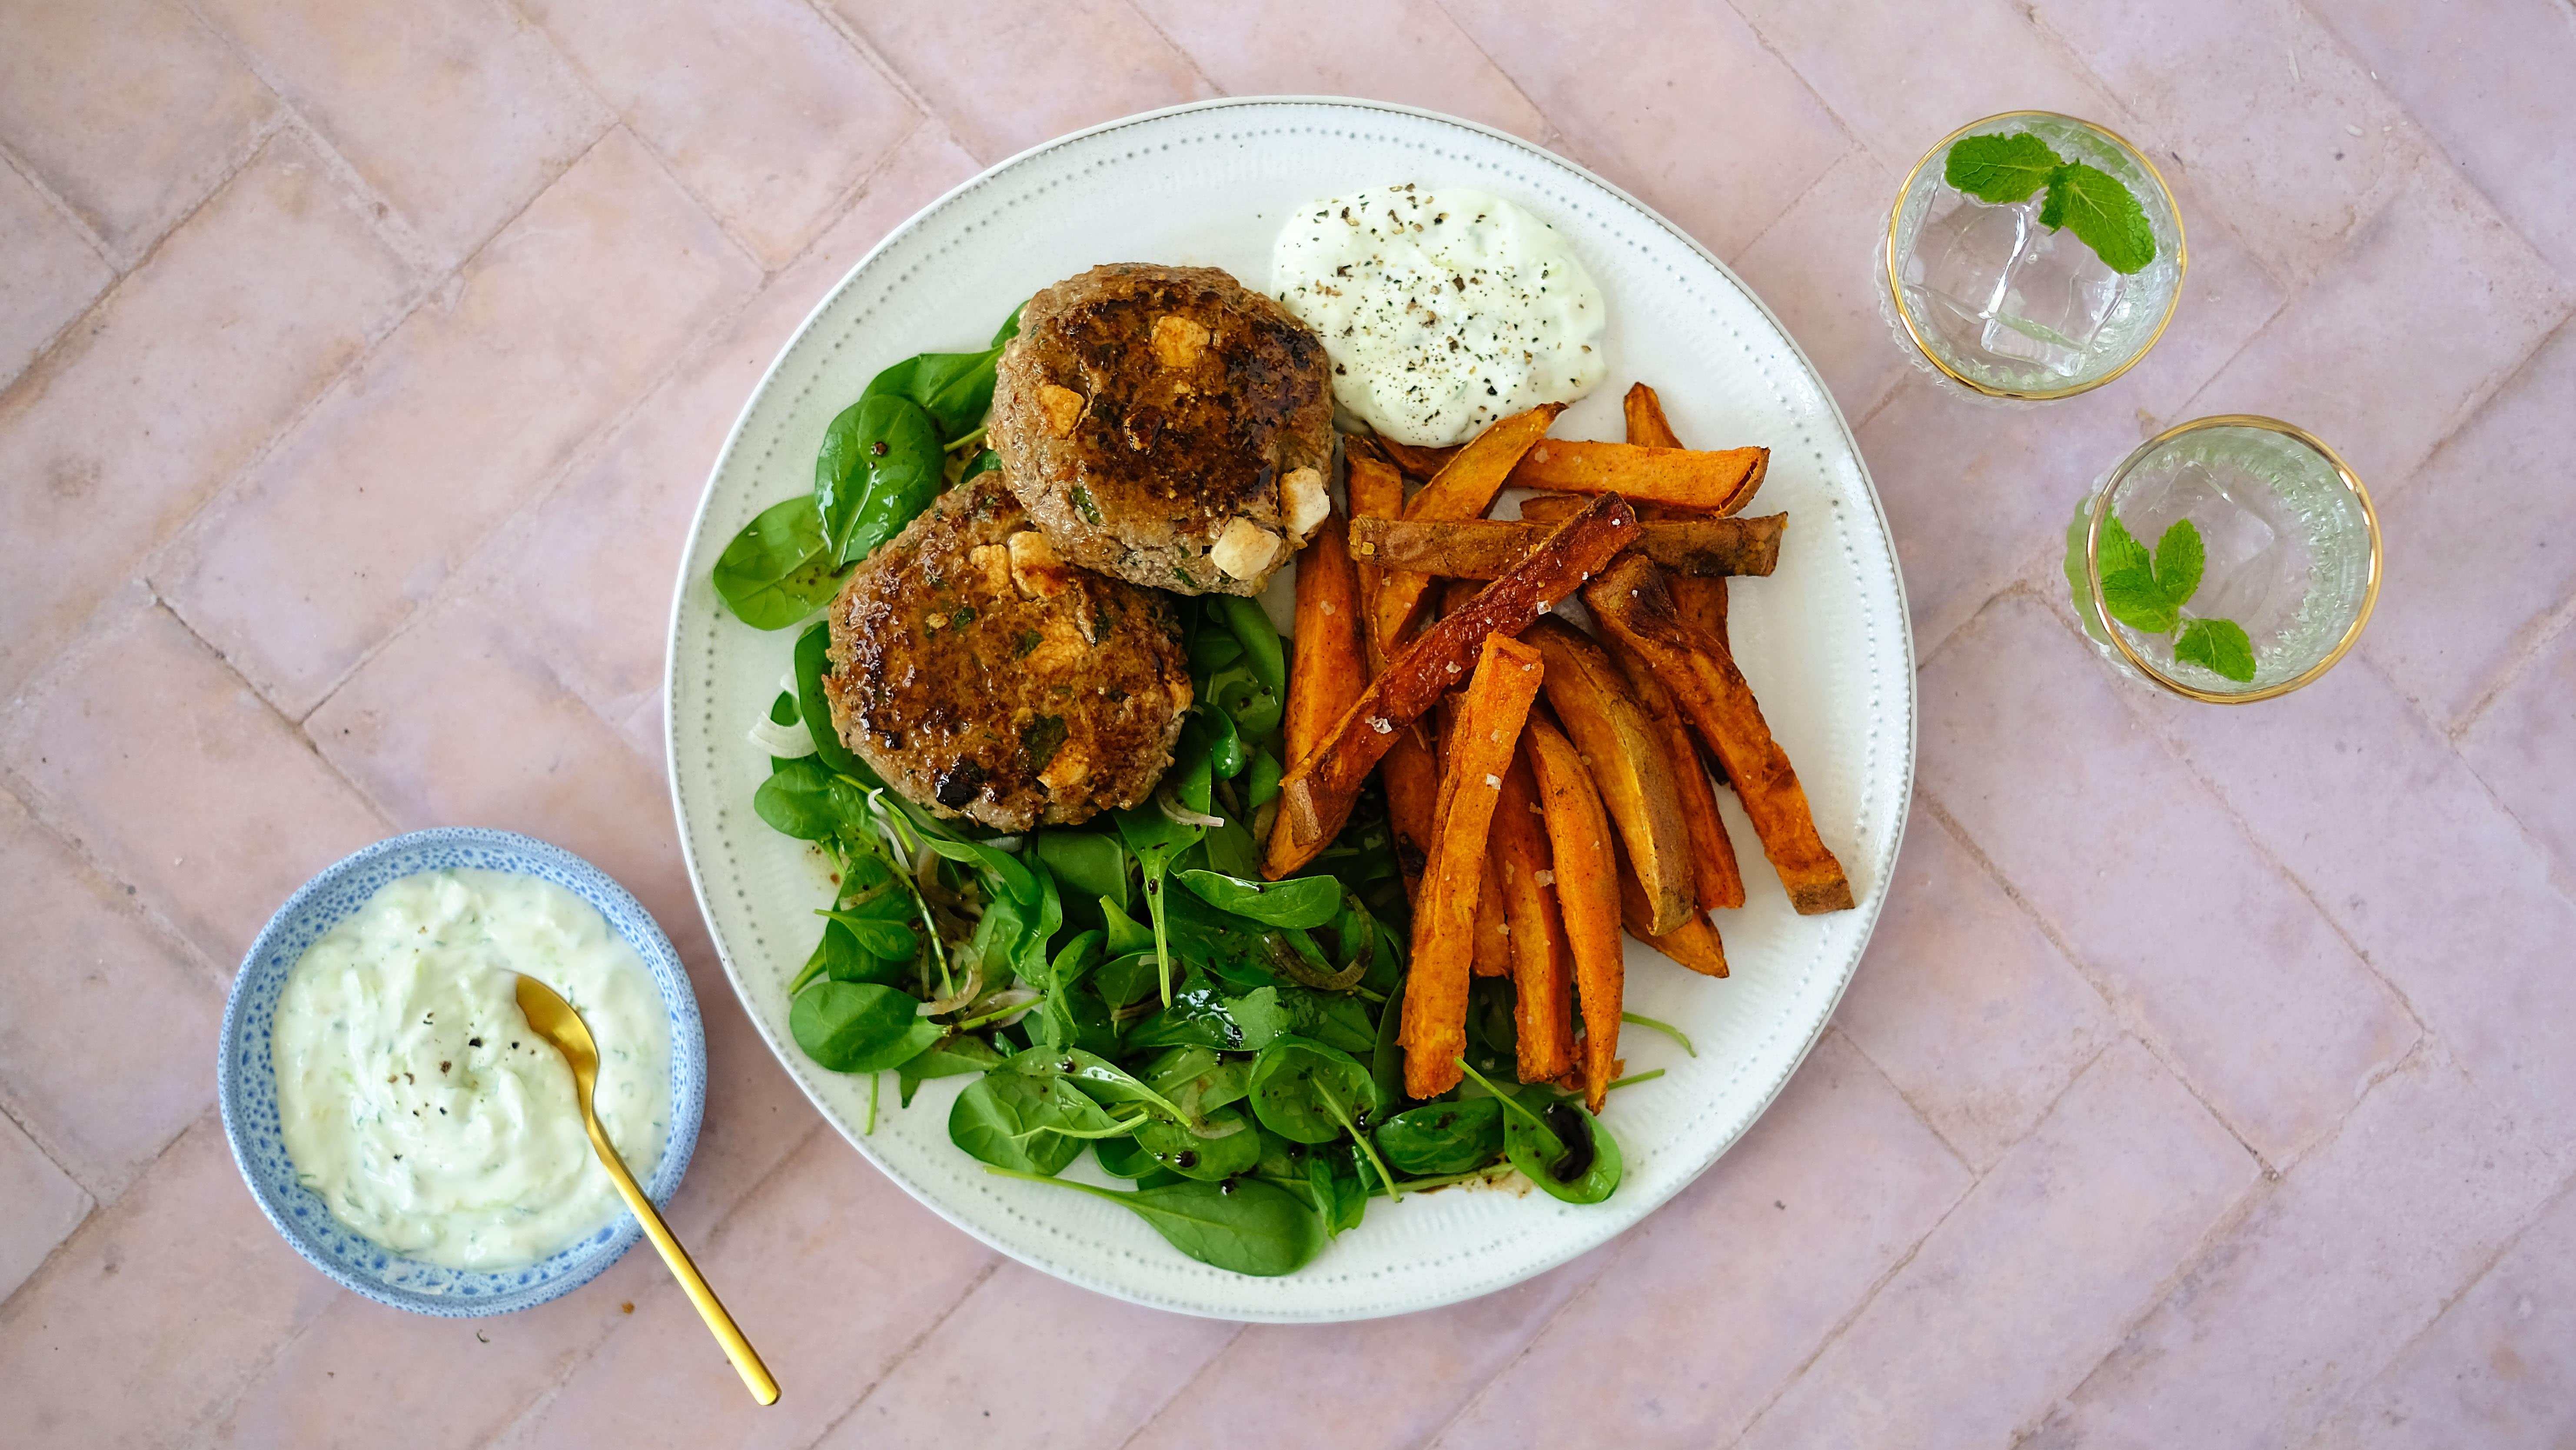 Minted Lamb and Feta Burgers with Sweet Potato Fries, Salad and Tzatziki